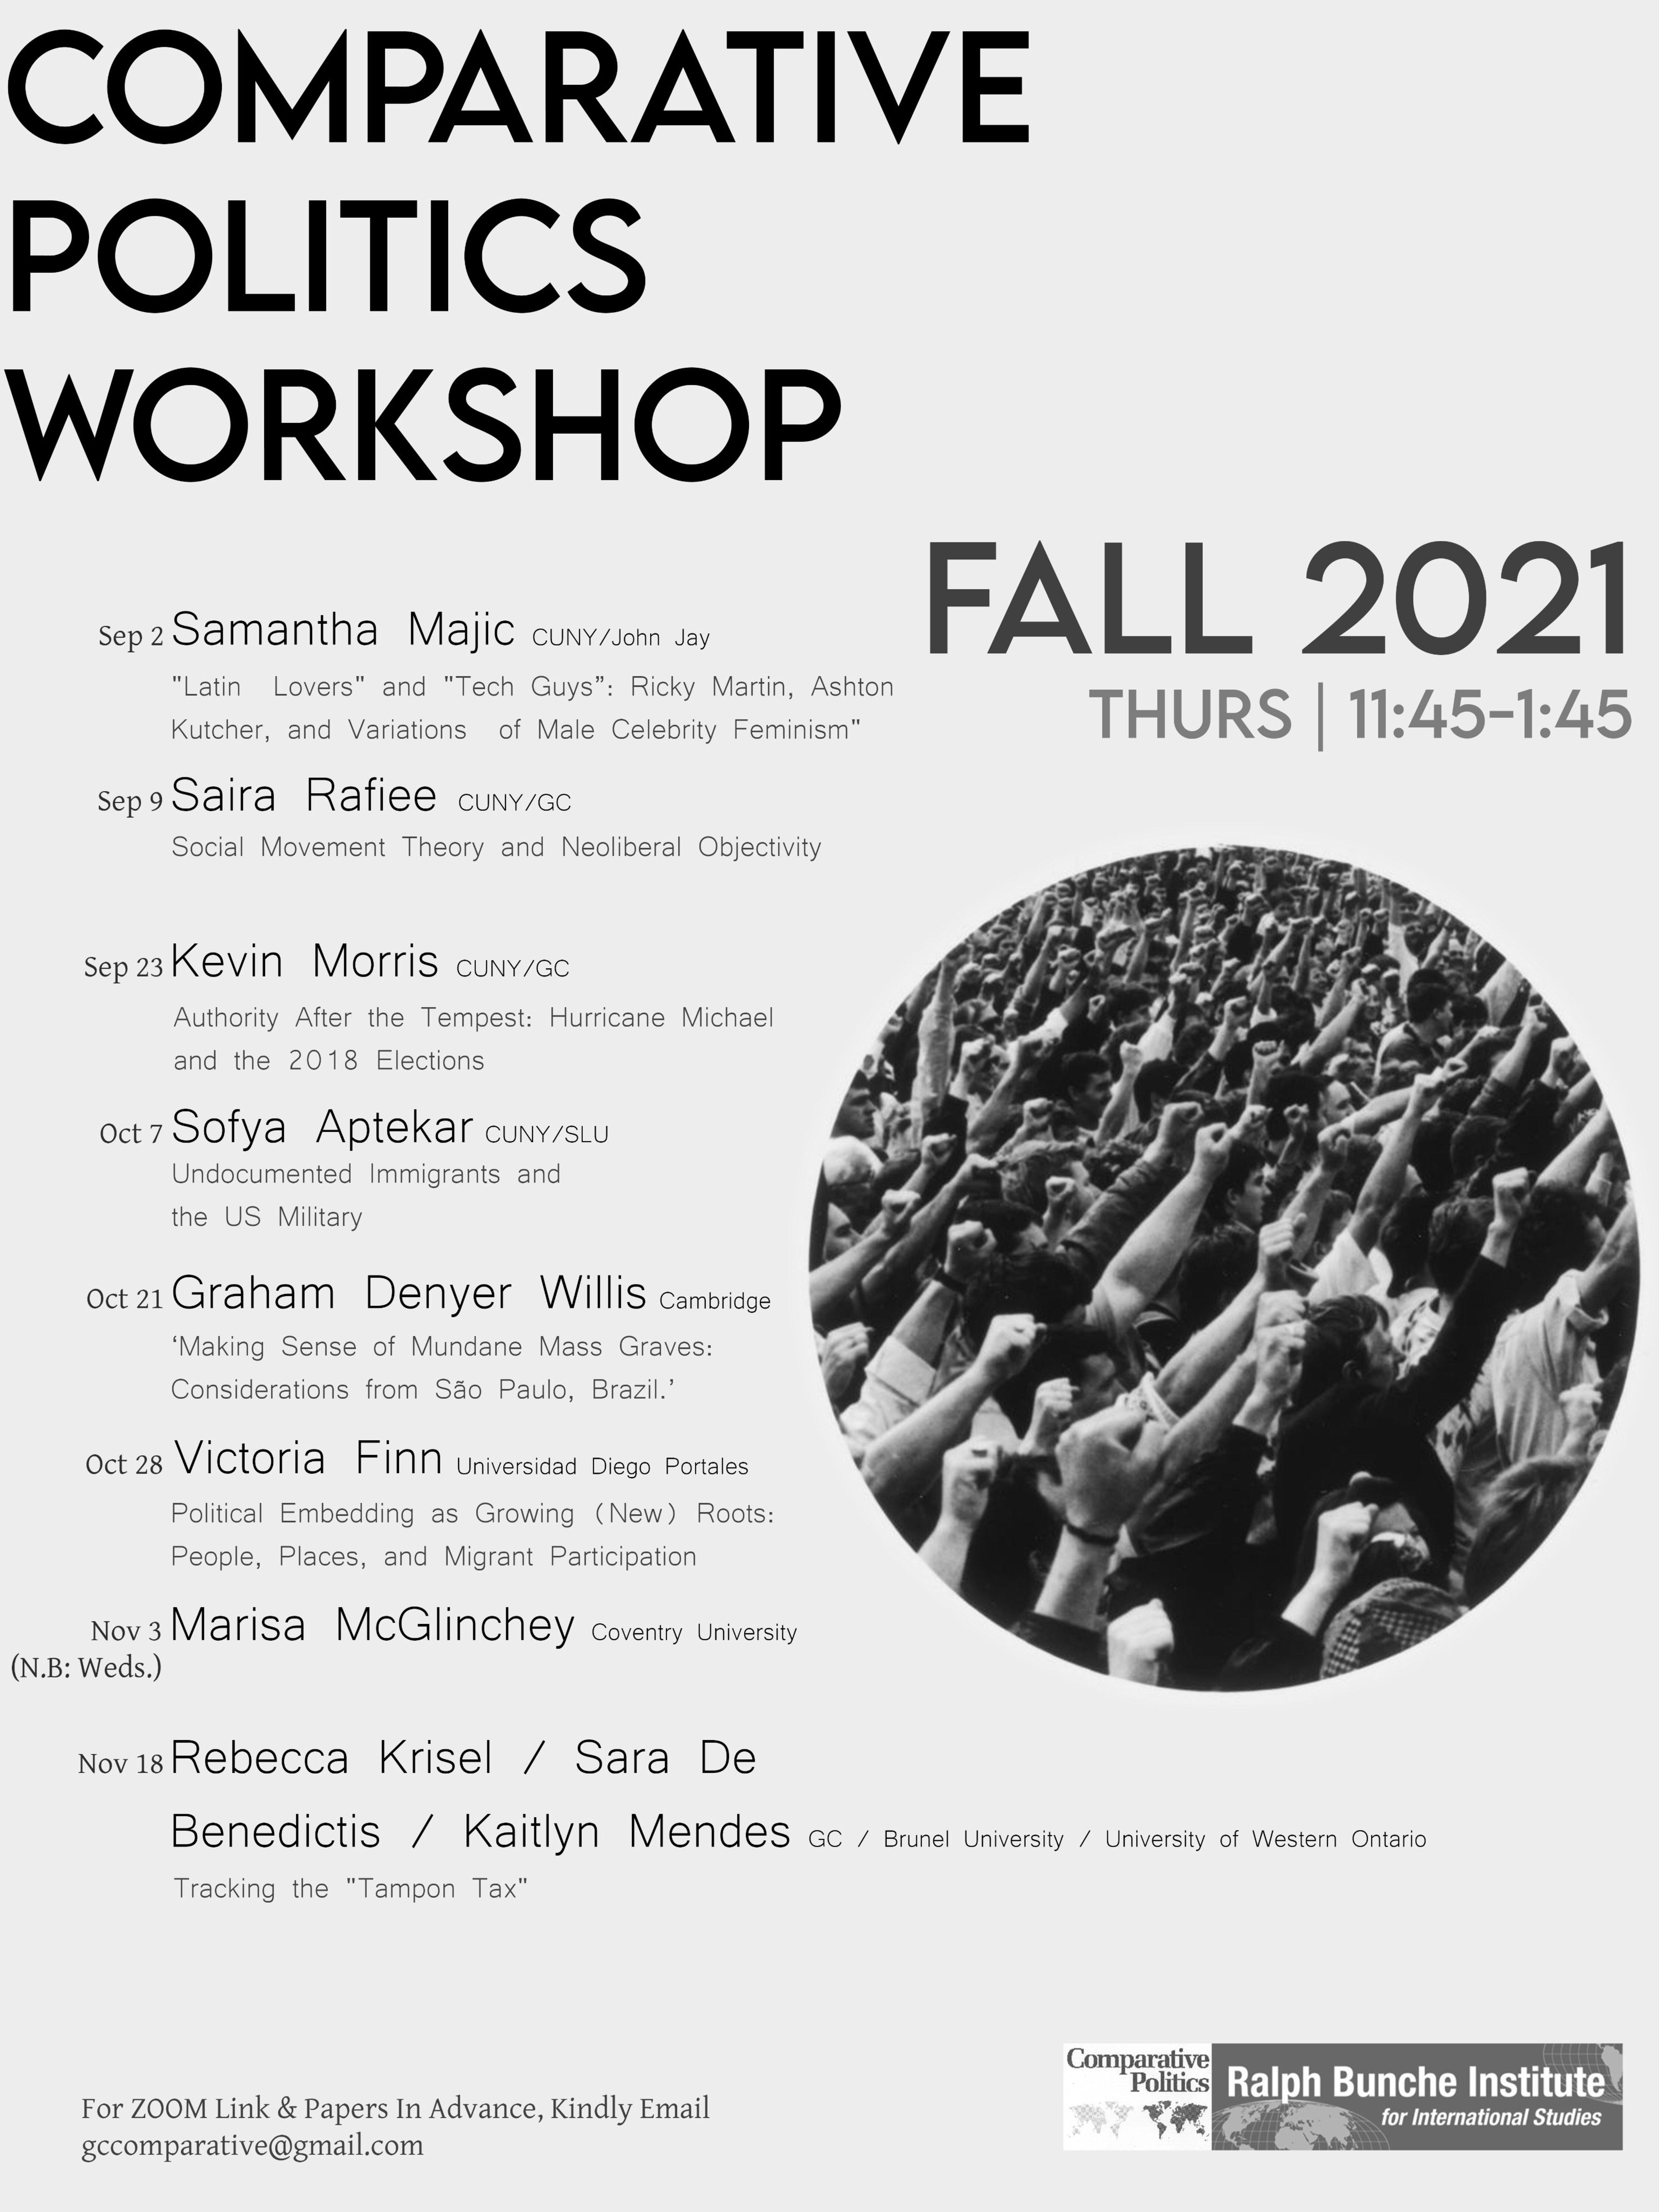 Comparative Politics Workshop Schedule Announced: Fall 2021